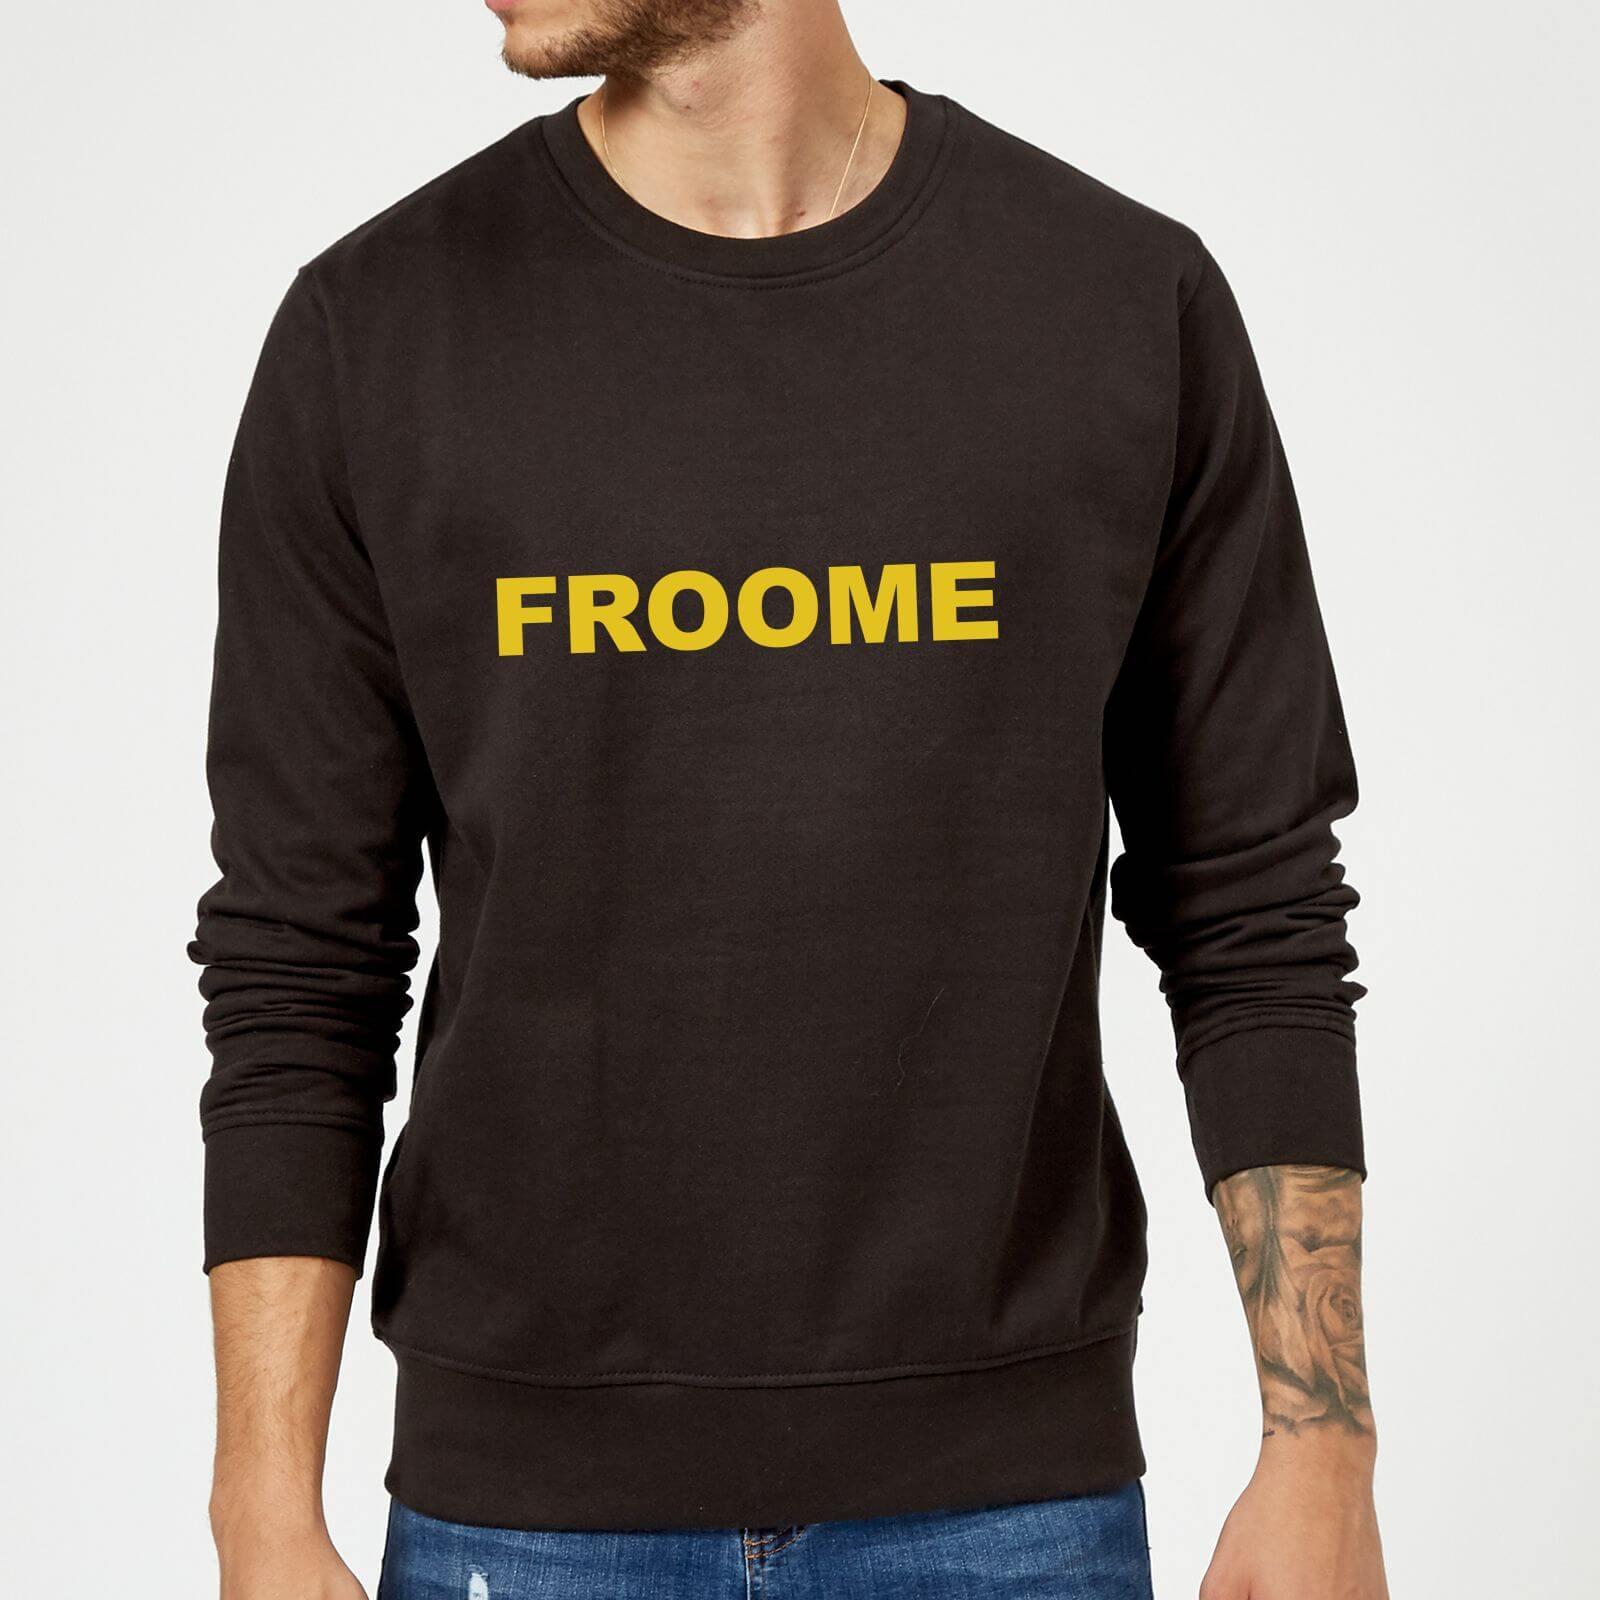 Summit Finish Froome - Rider Name Sweatshirt - Black - XL - Black